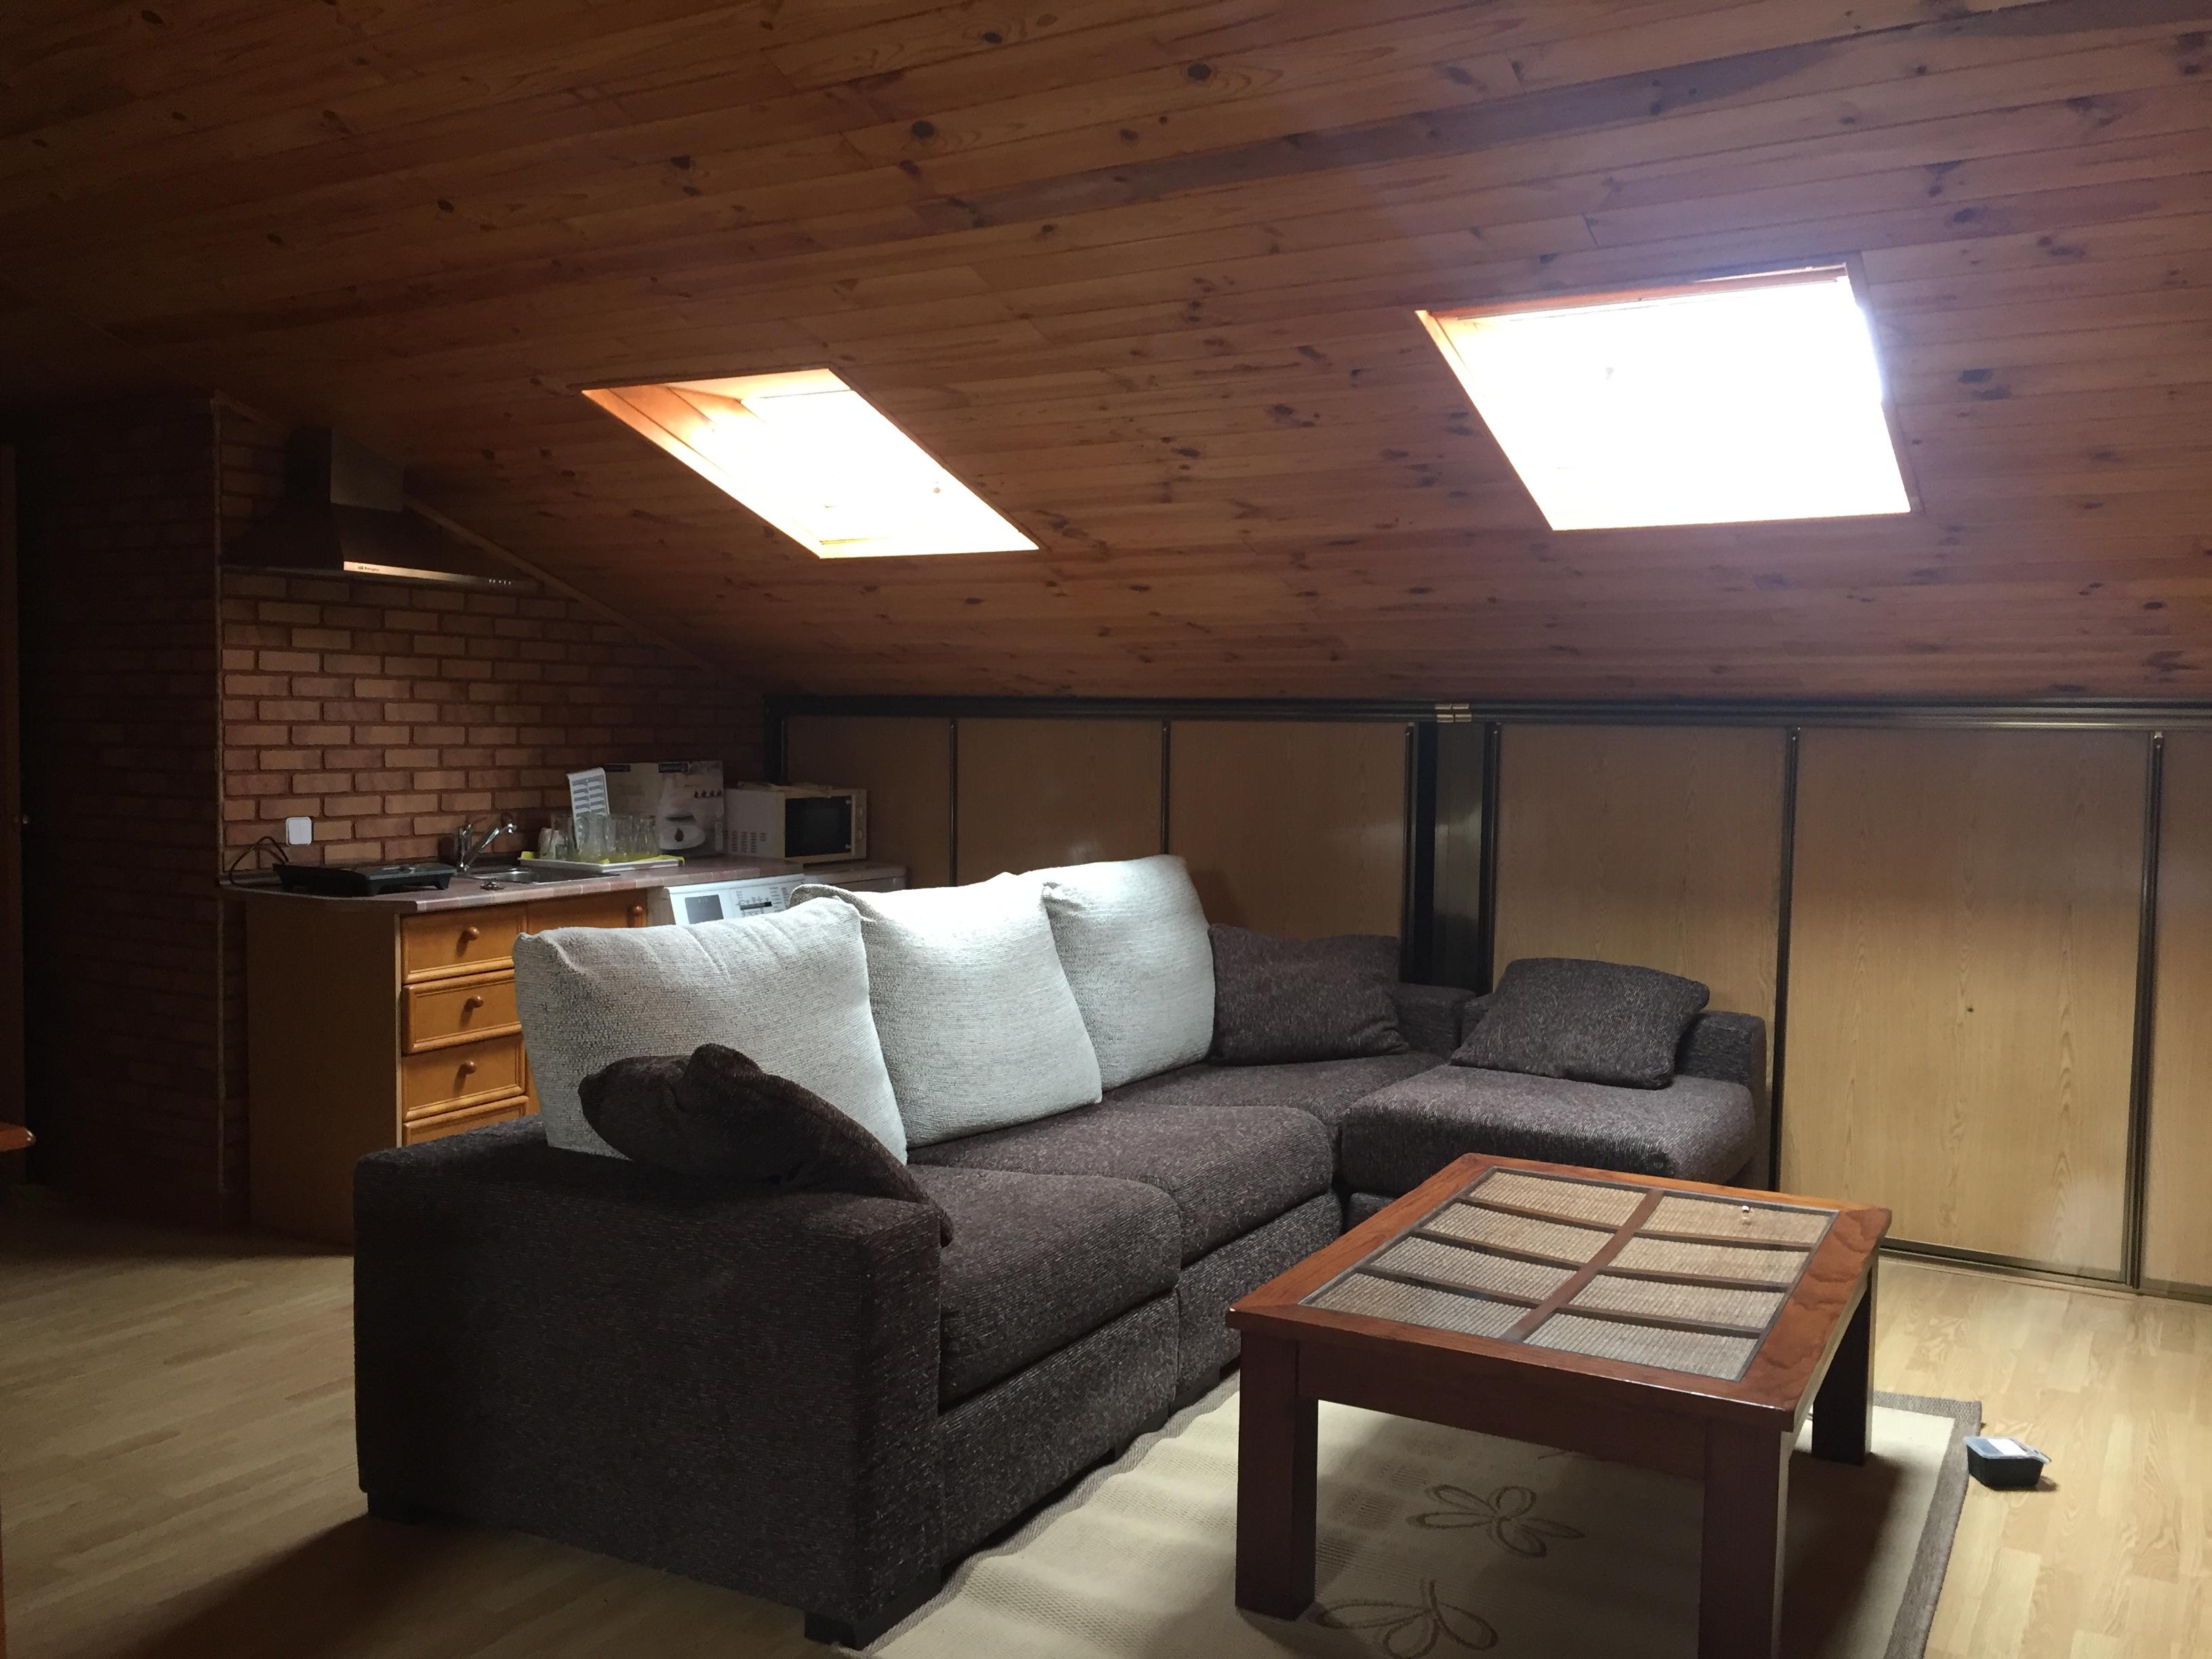 Dorado de techos e impermeabilizacion